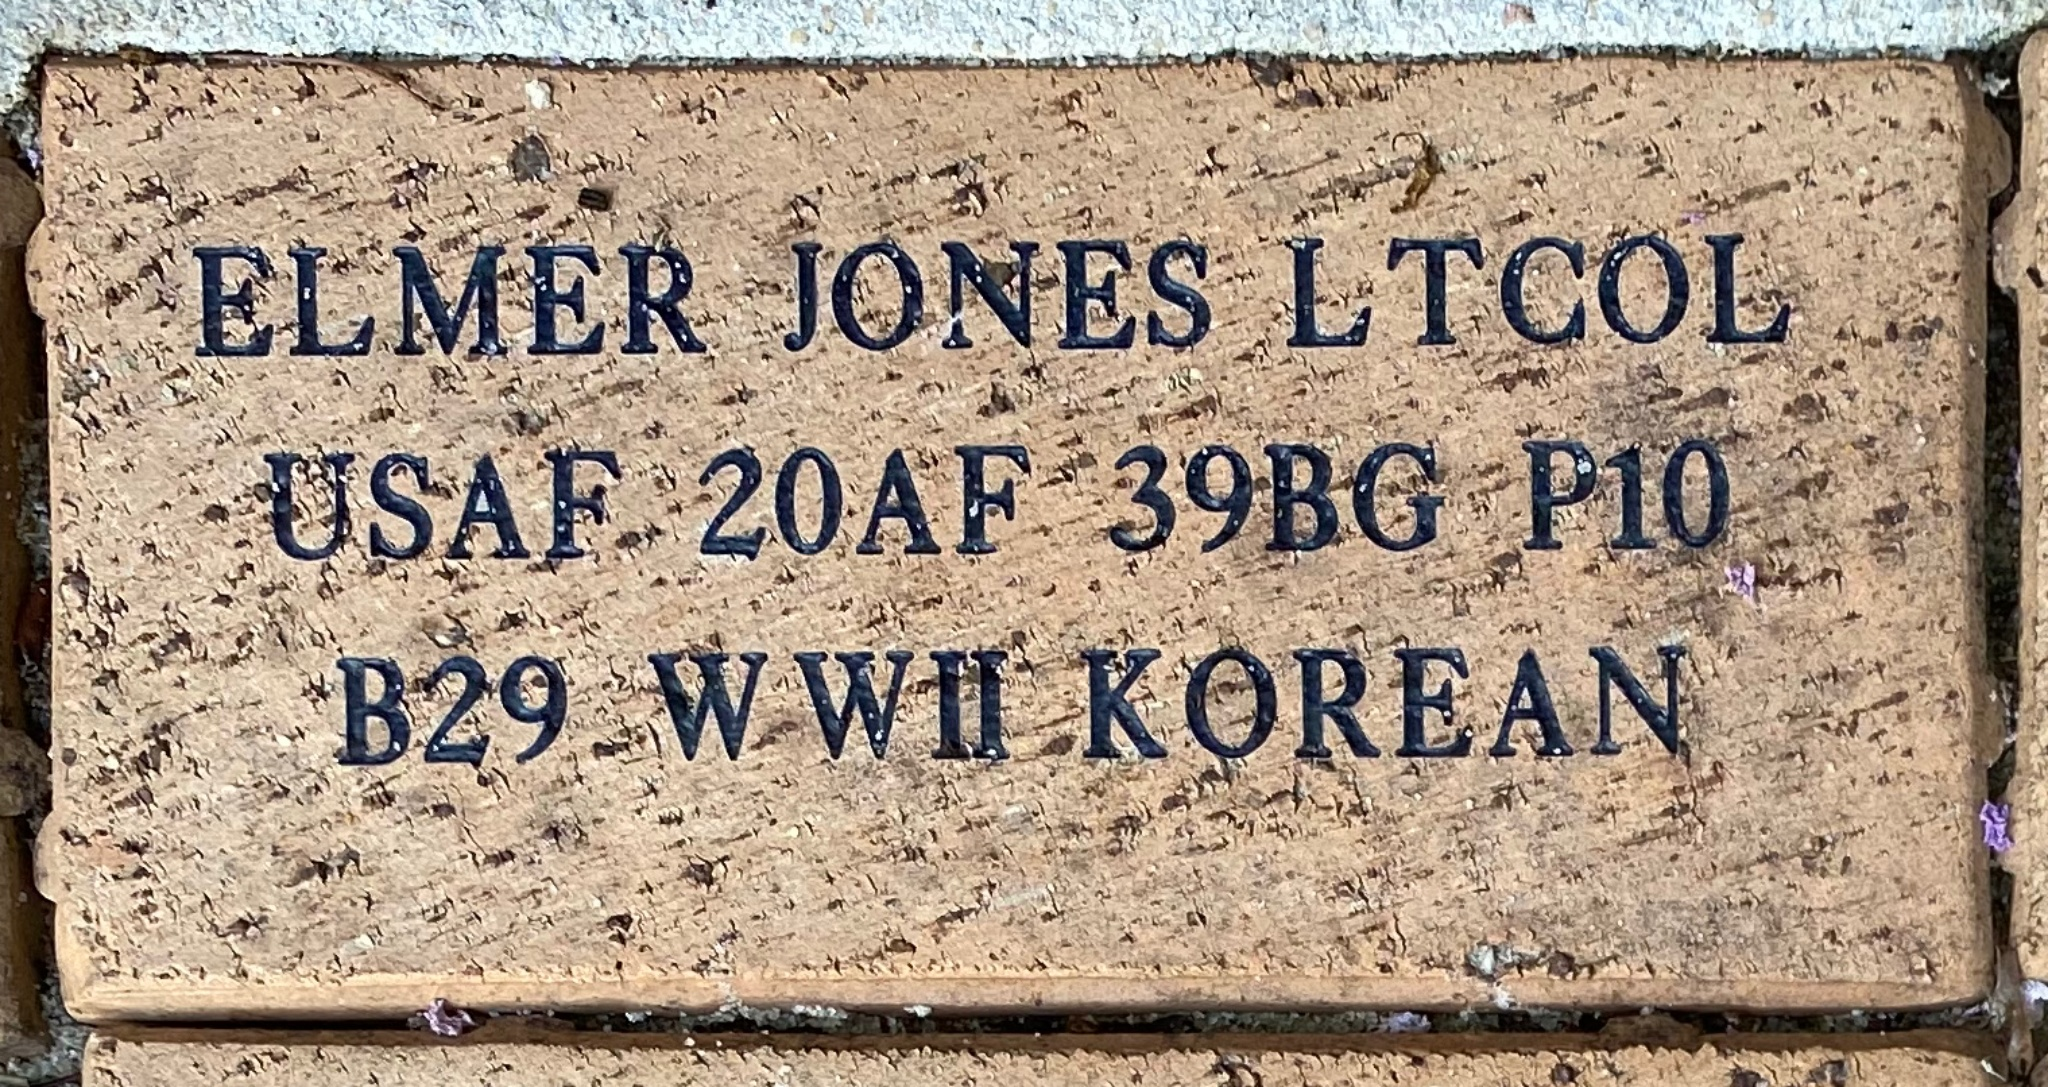 ELMER JONES LTCOL USAF 20A F 39BG P10 B29 WWII KOREAN